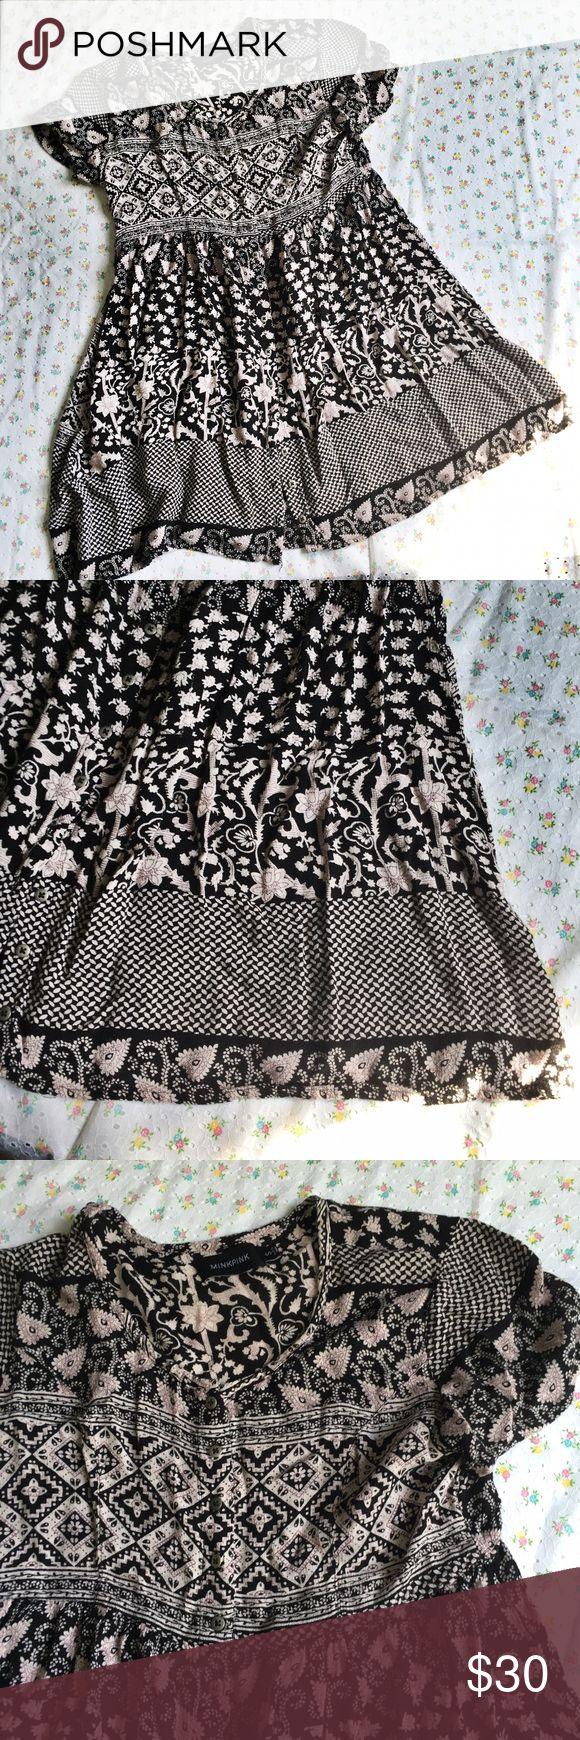 MINK PINK floral button hippie boho festival Gorgeous simple dress. Size small. Mink Pink. Grey/cream & black floral. MINKPINK Dresses Mini